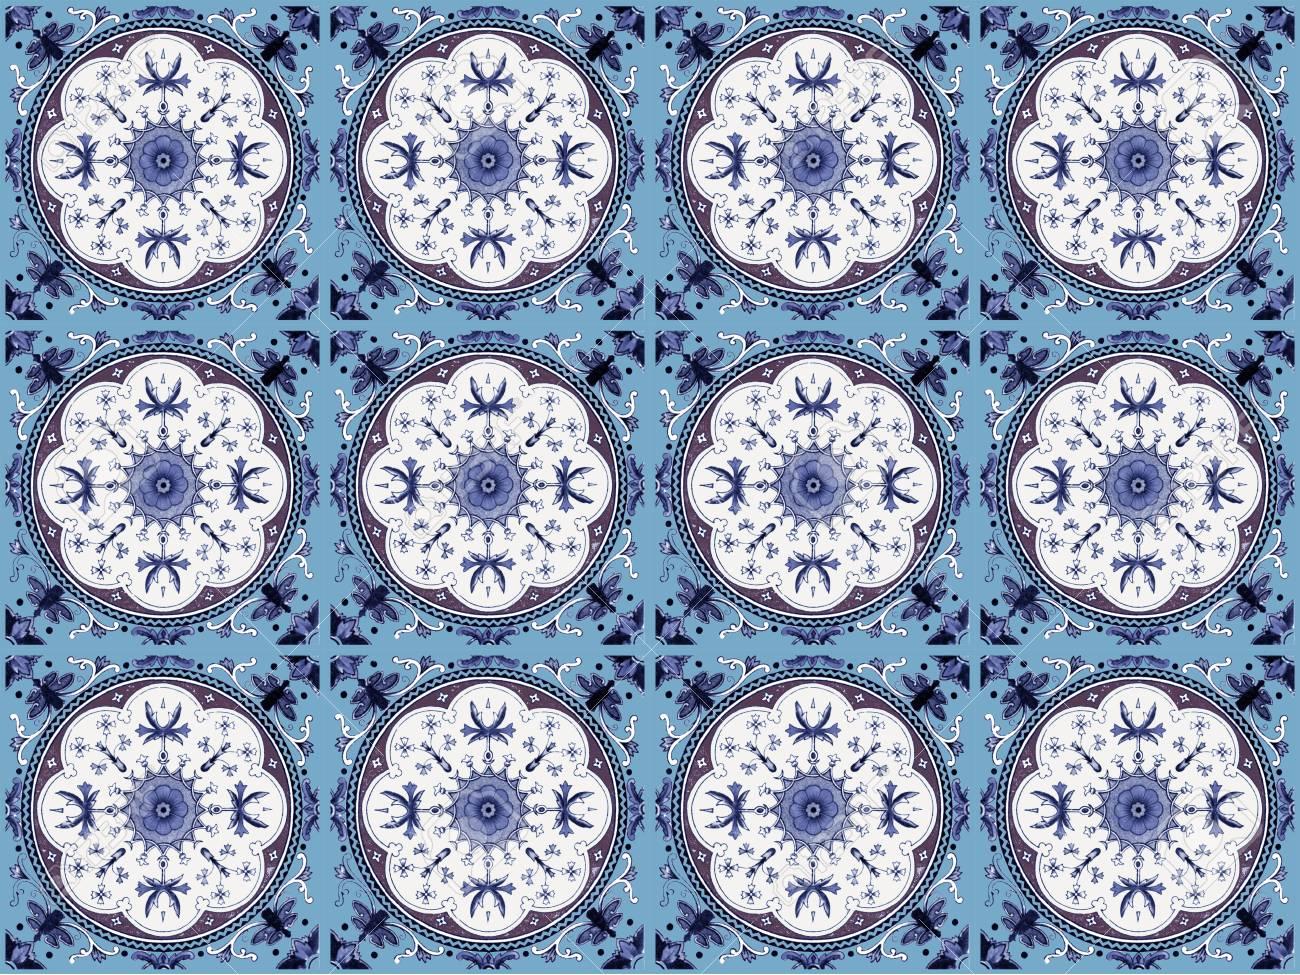 moroccan tile pattern background colorful vintage ceramic tiles